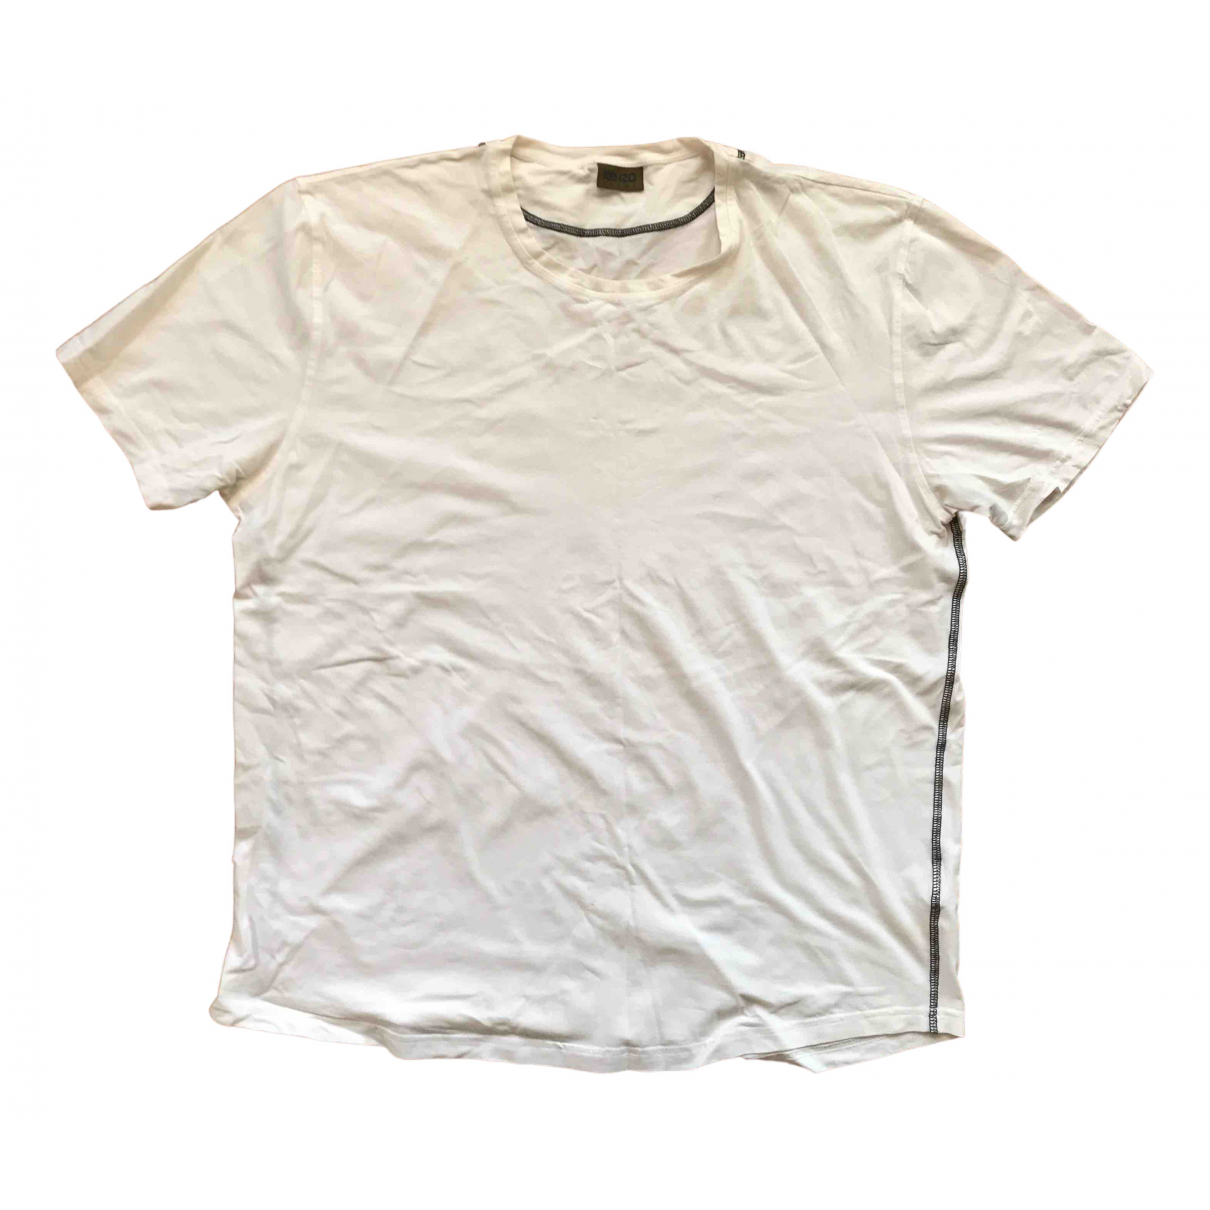 Kenzo - Tee shirts   pour homme en coton - blanc